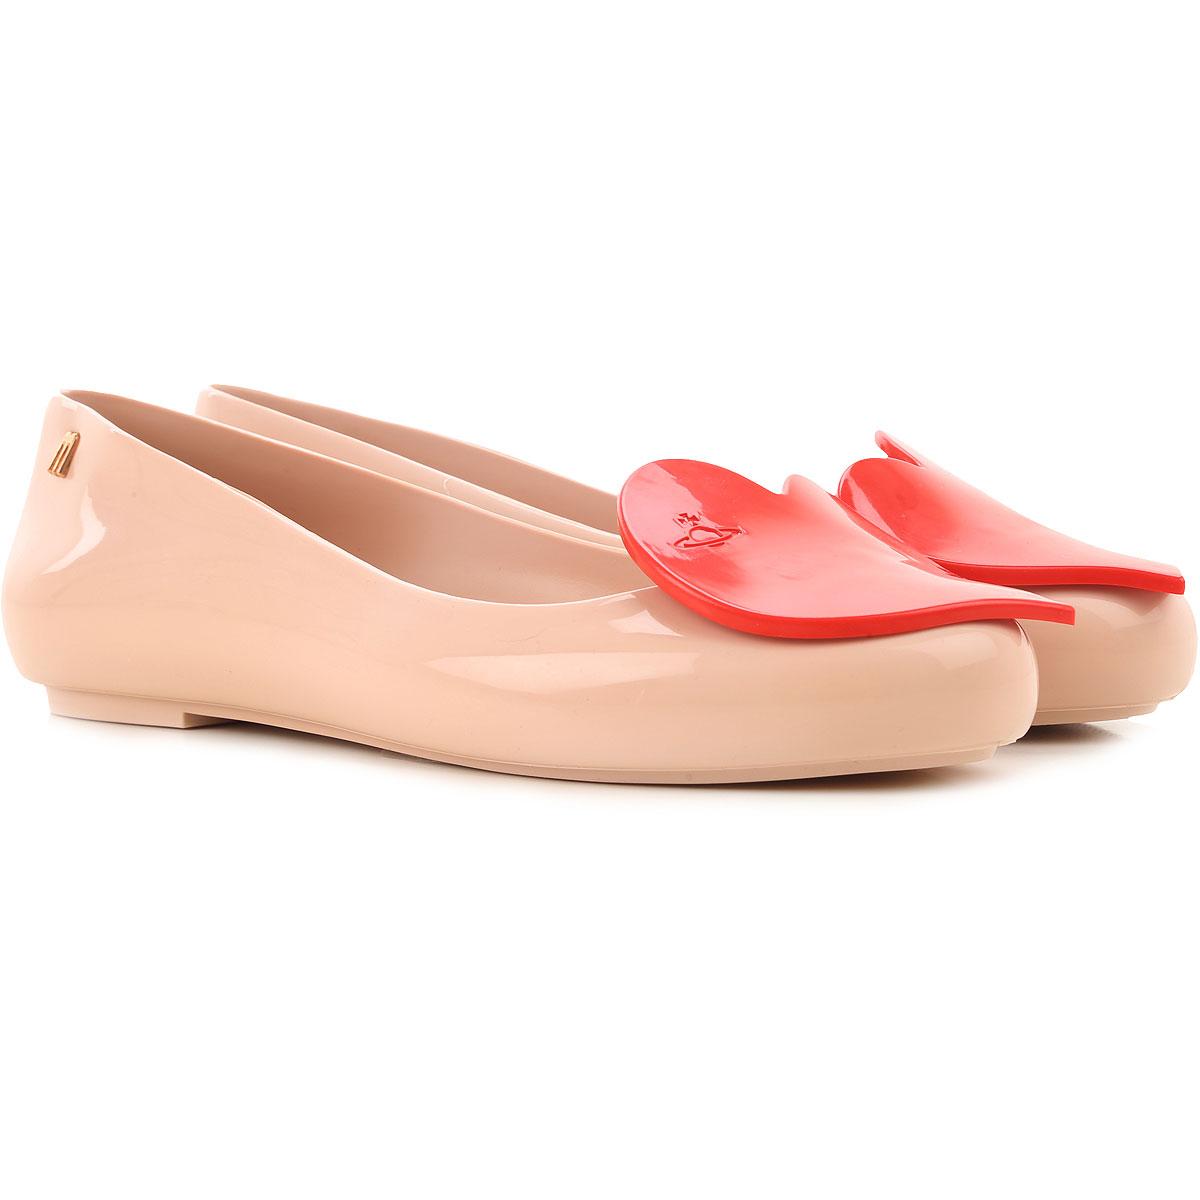 Melissa Ballet Flats Ballerina Shoes for Women On Sale, Light Pink, PVC, 2019, USA 5 - EUR 35/36 USA 6 - EUR 37 USA 7 - EUR 38 USA 8 - EUR 39 USA 9 -